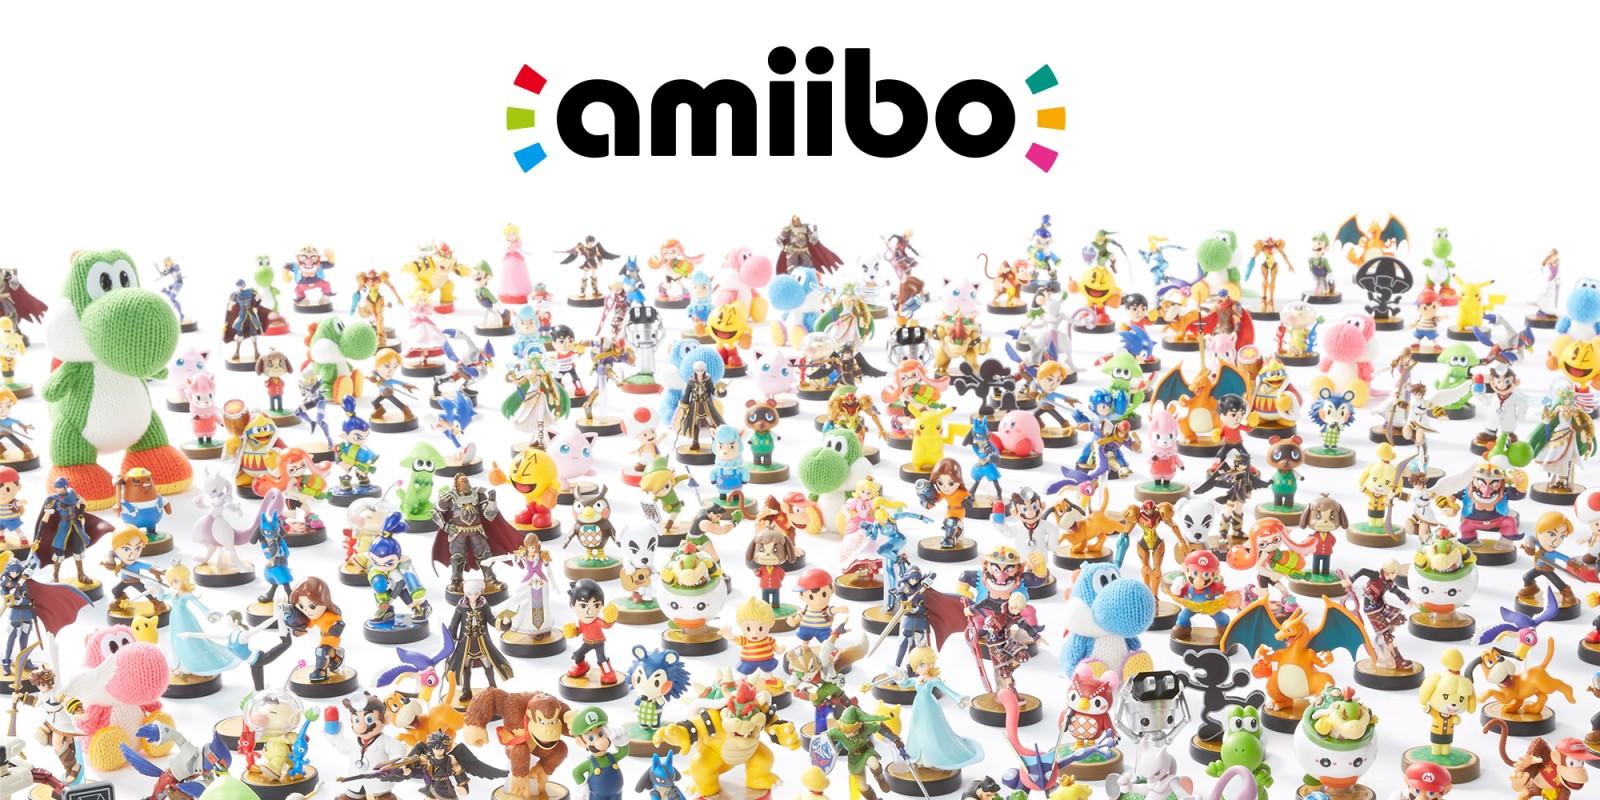 H2x1_Amiibo_main_image1600w